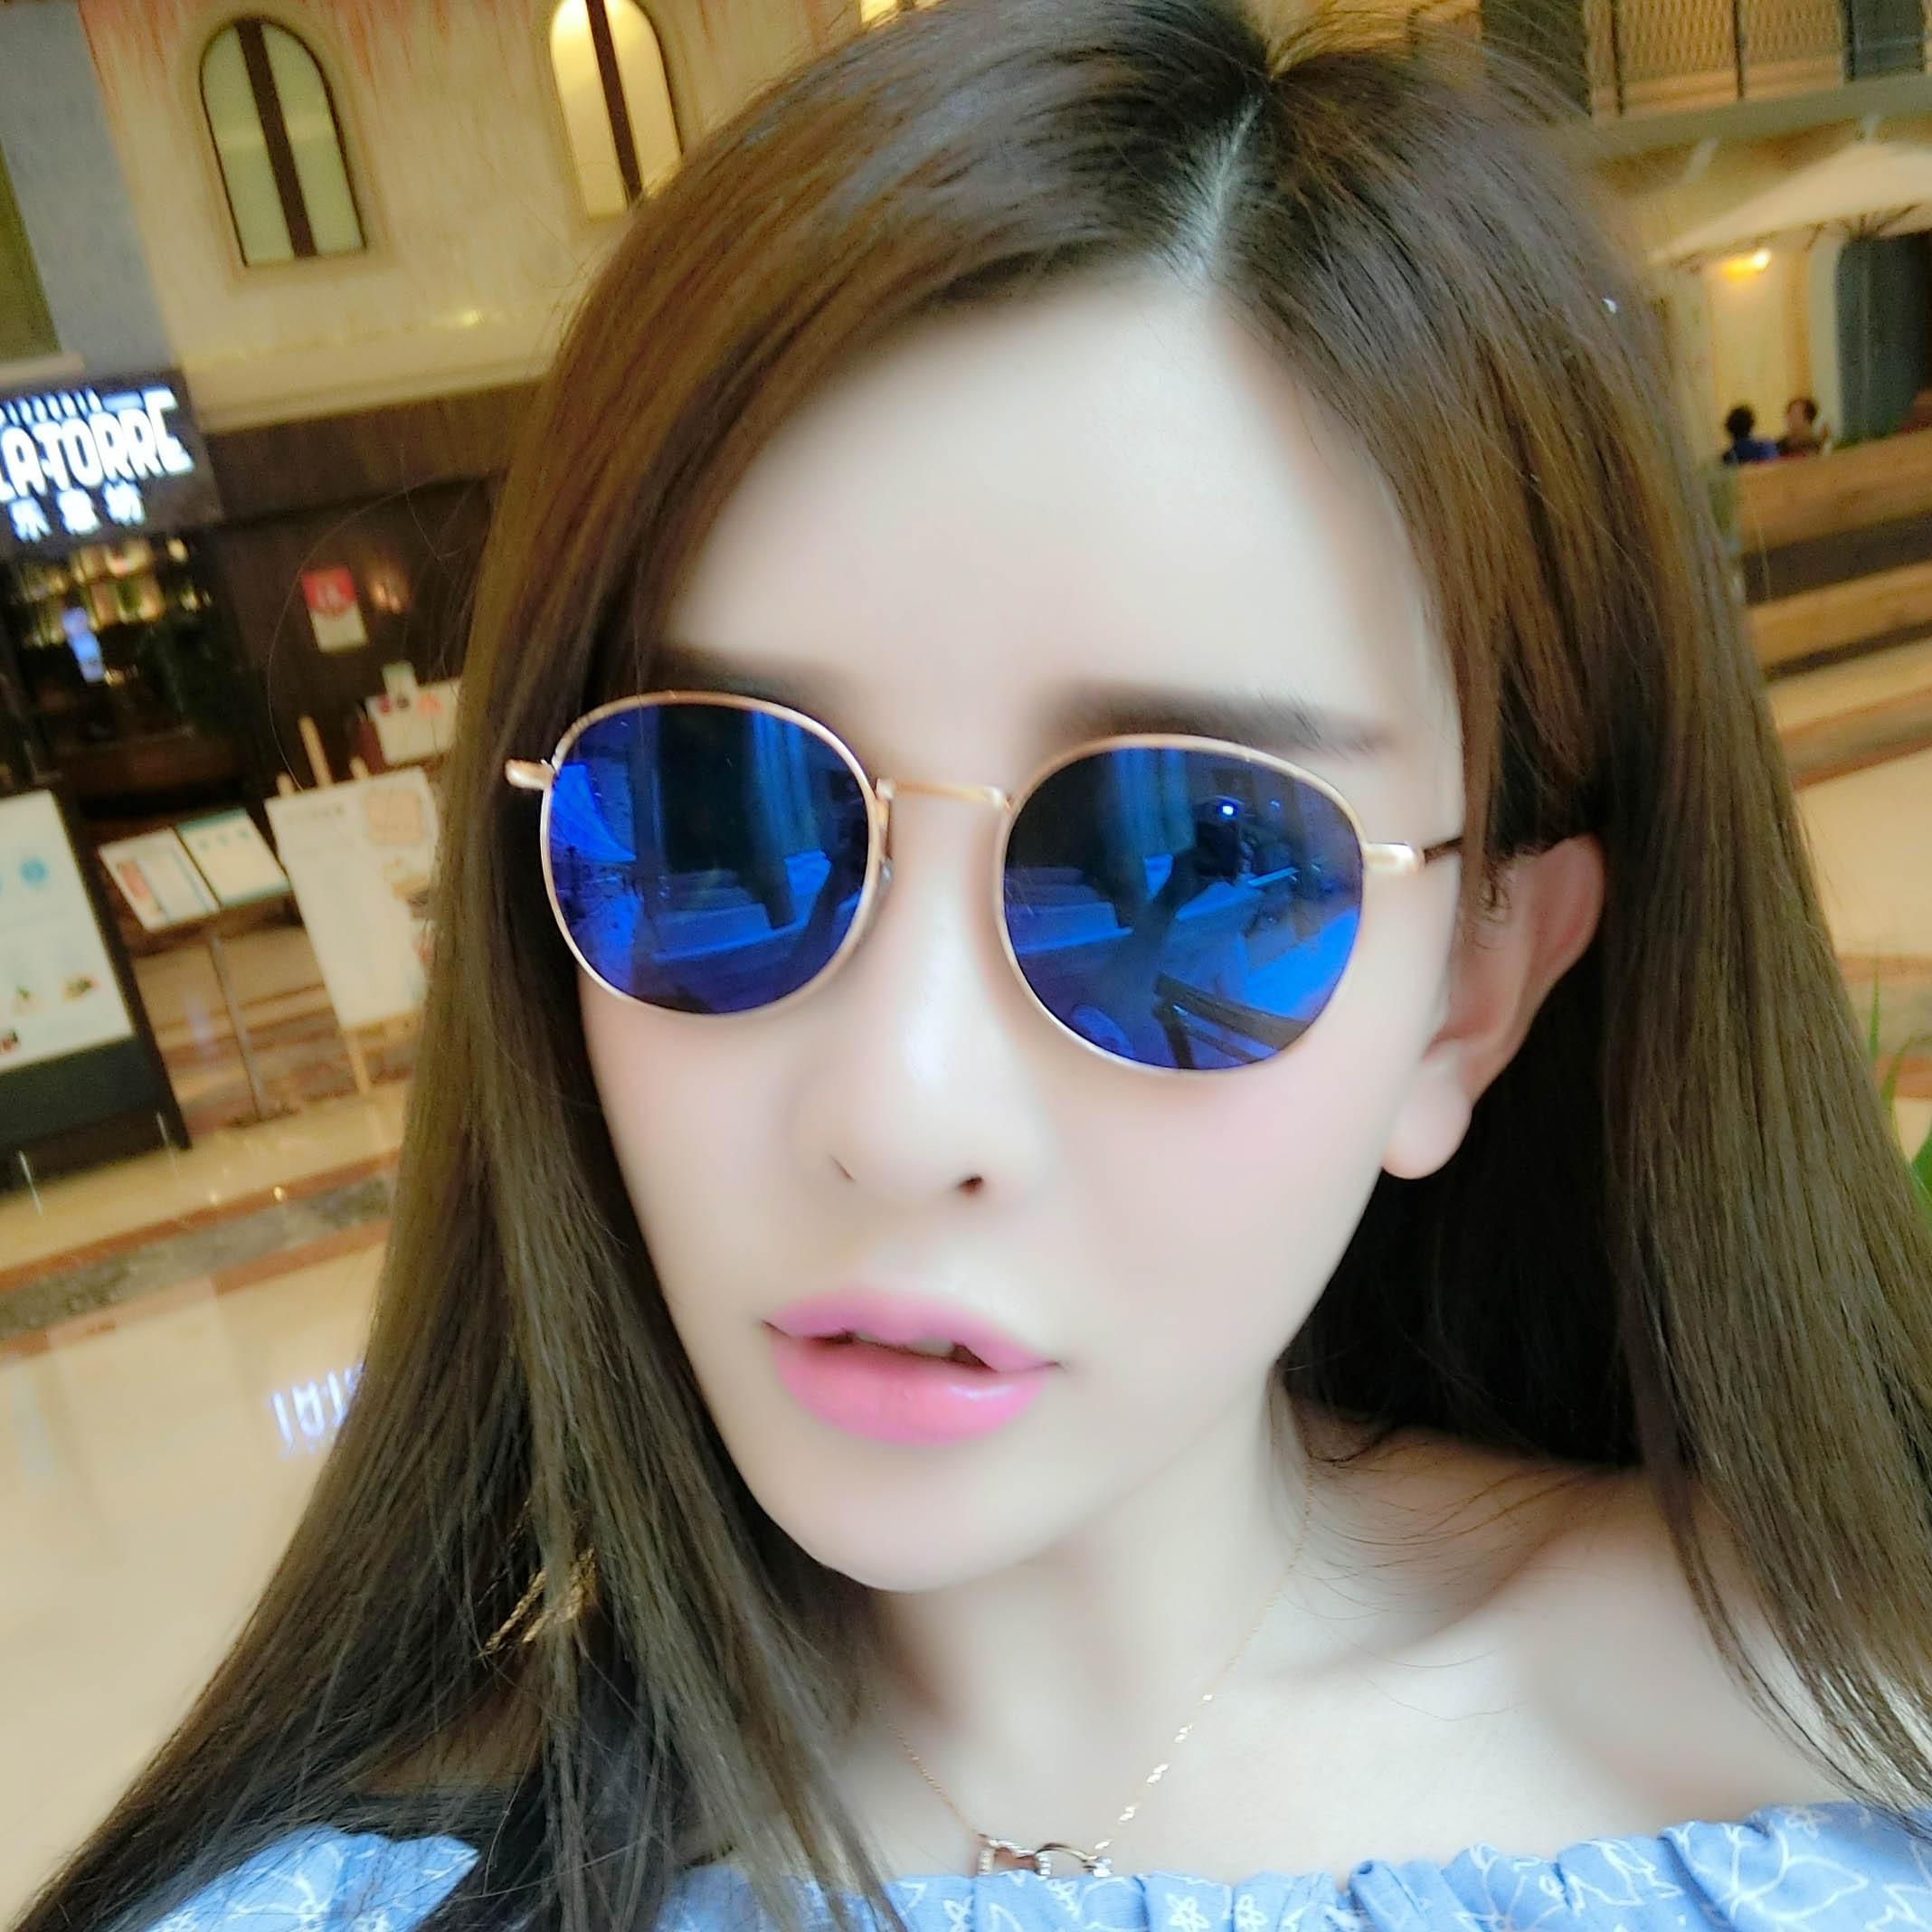 Kacamata hitam wanita wajah bulat Gaya Korea Jaring pasang merah Model  artis kacamata 2018 model baru 559b46757a